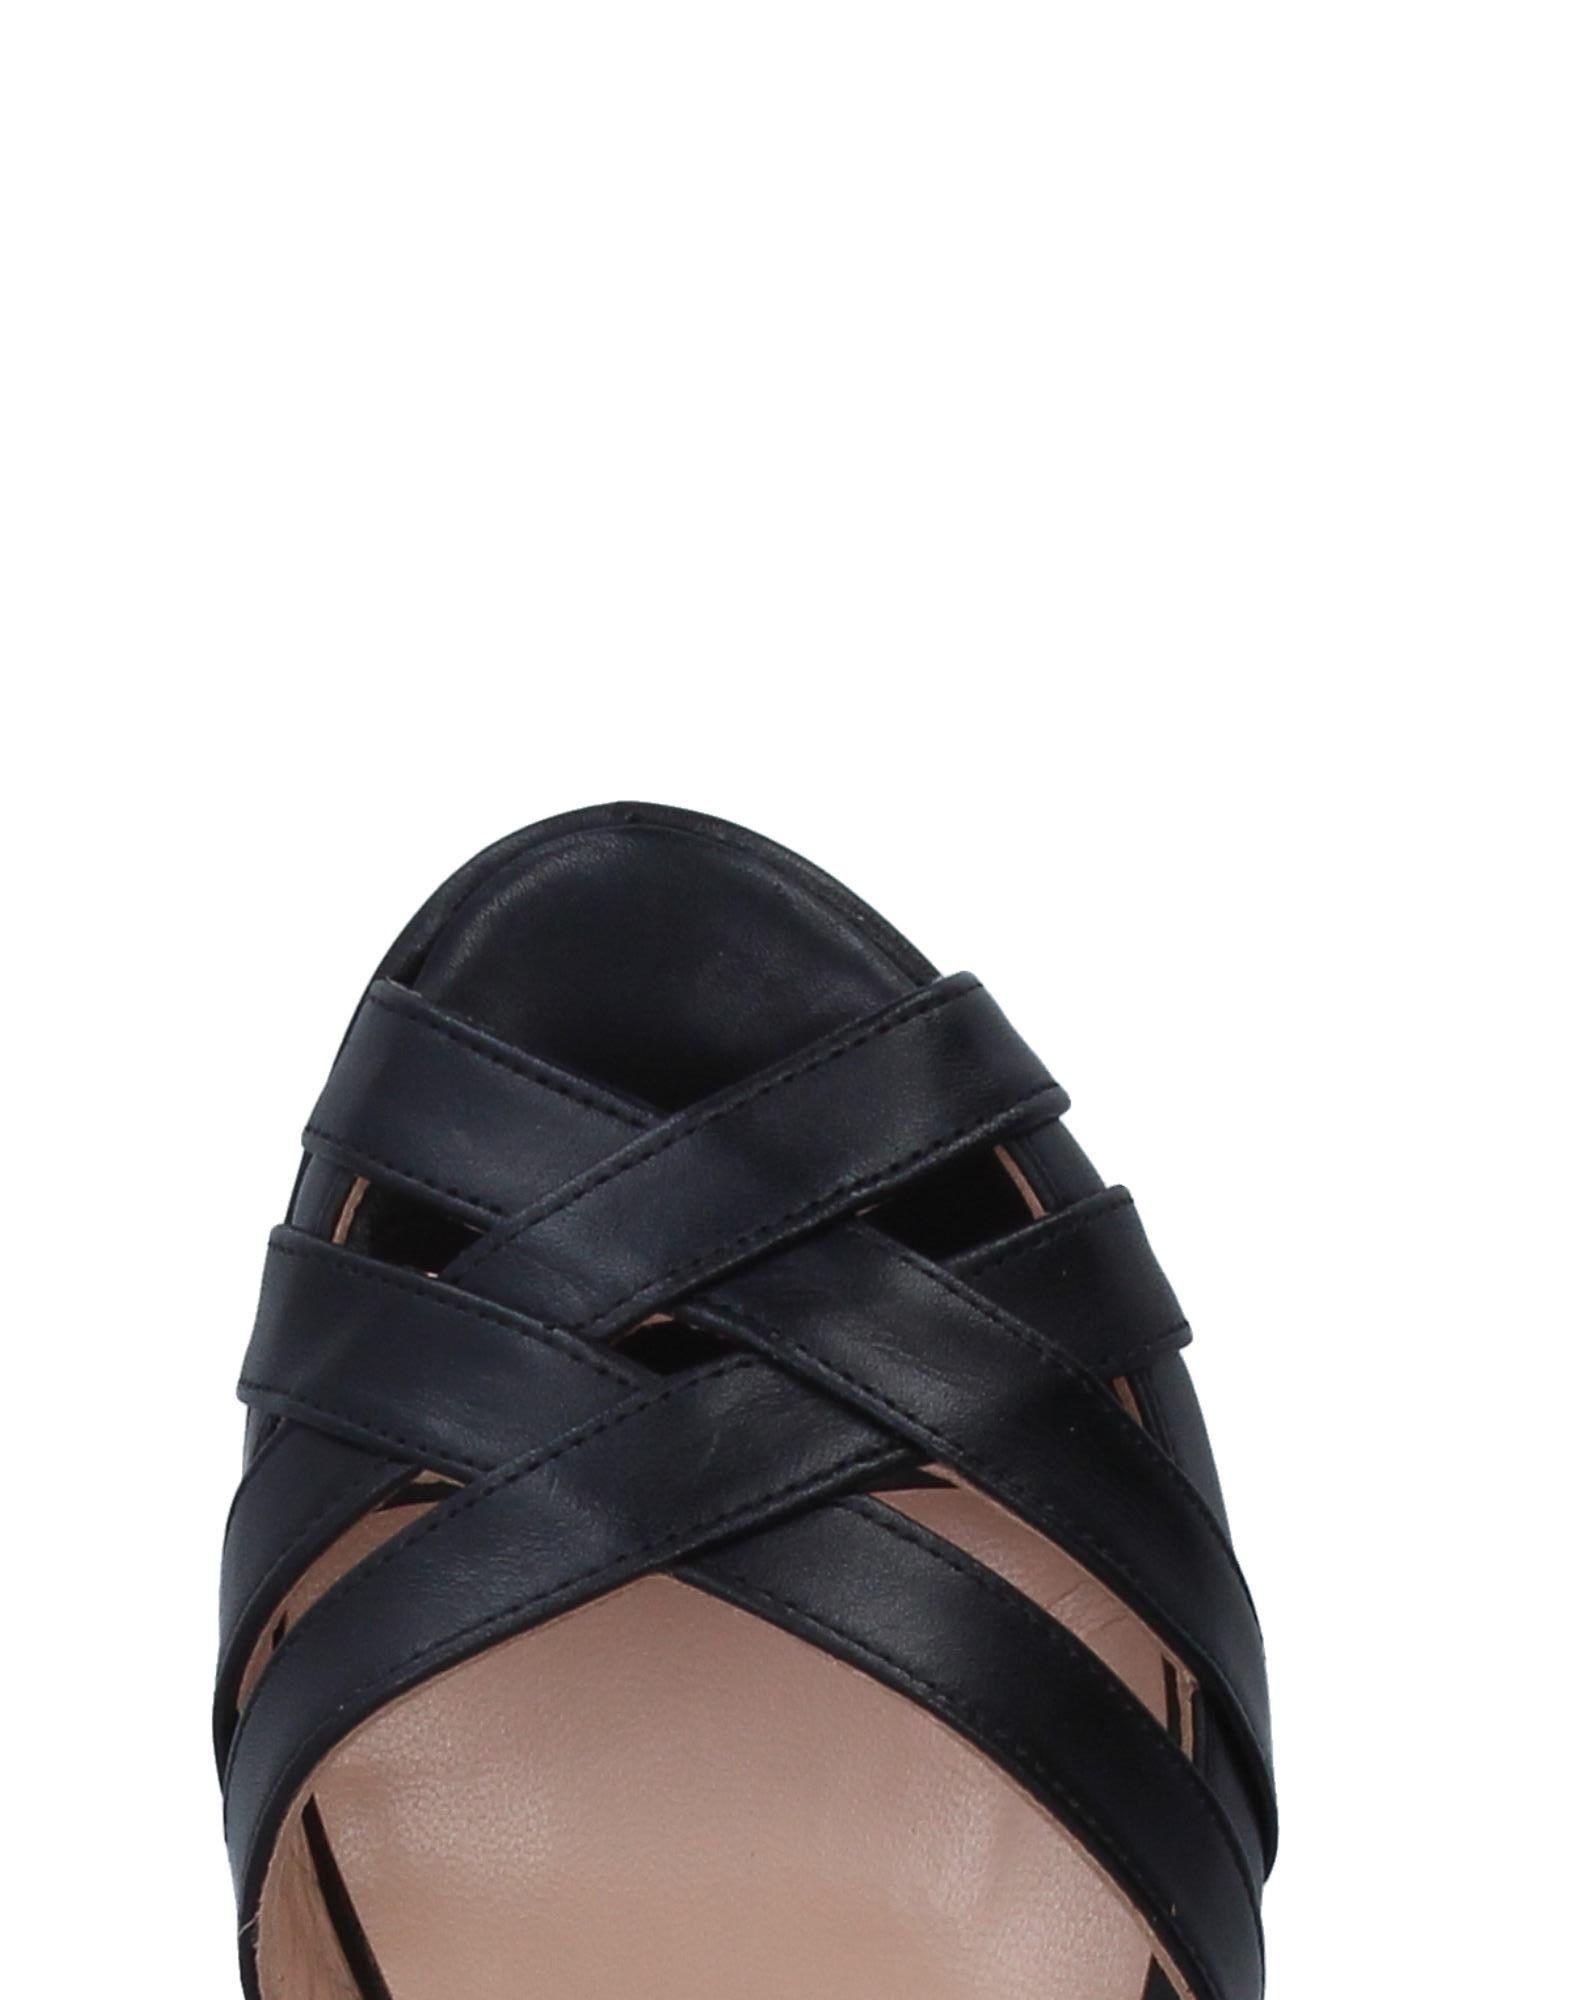 Sandales Allison Femme - Sandales Allison sur